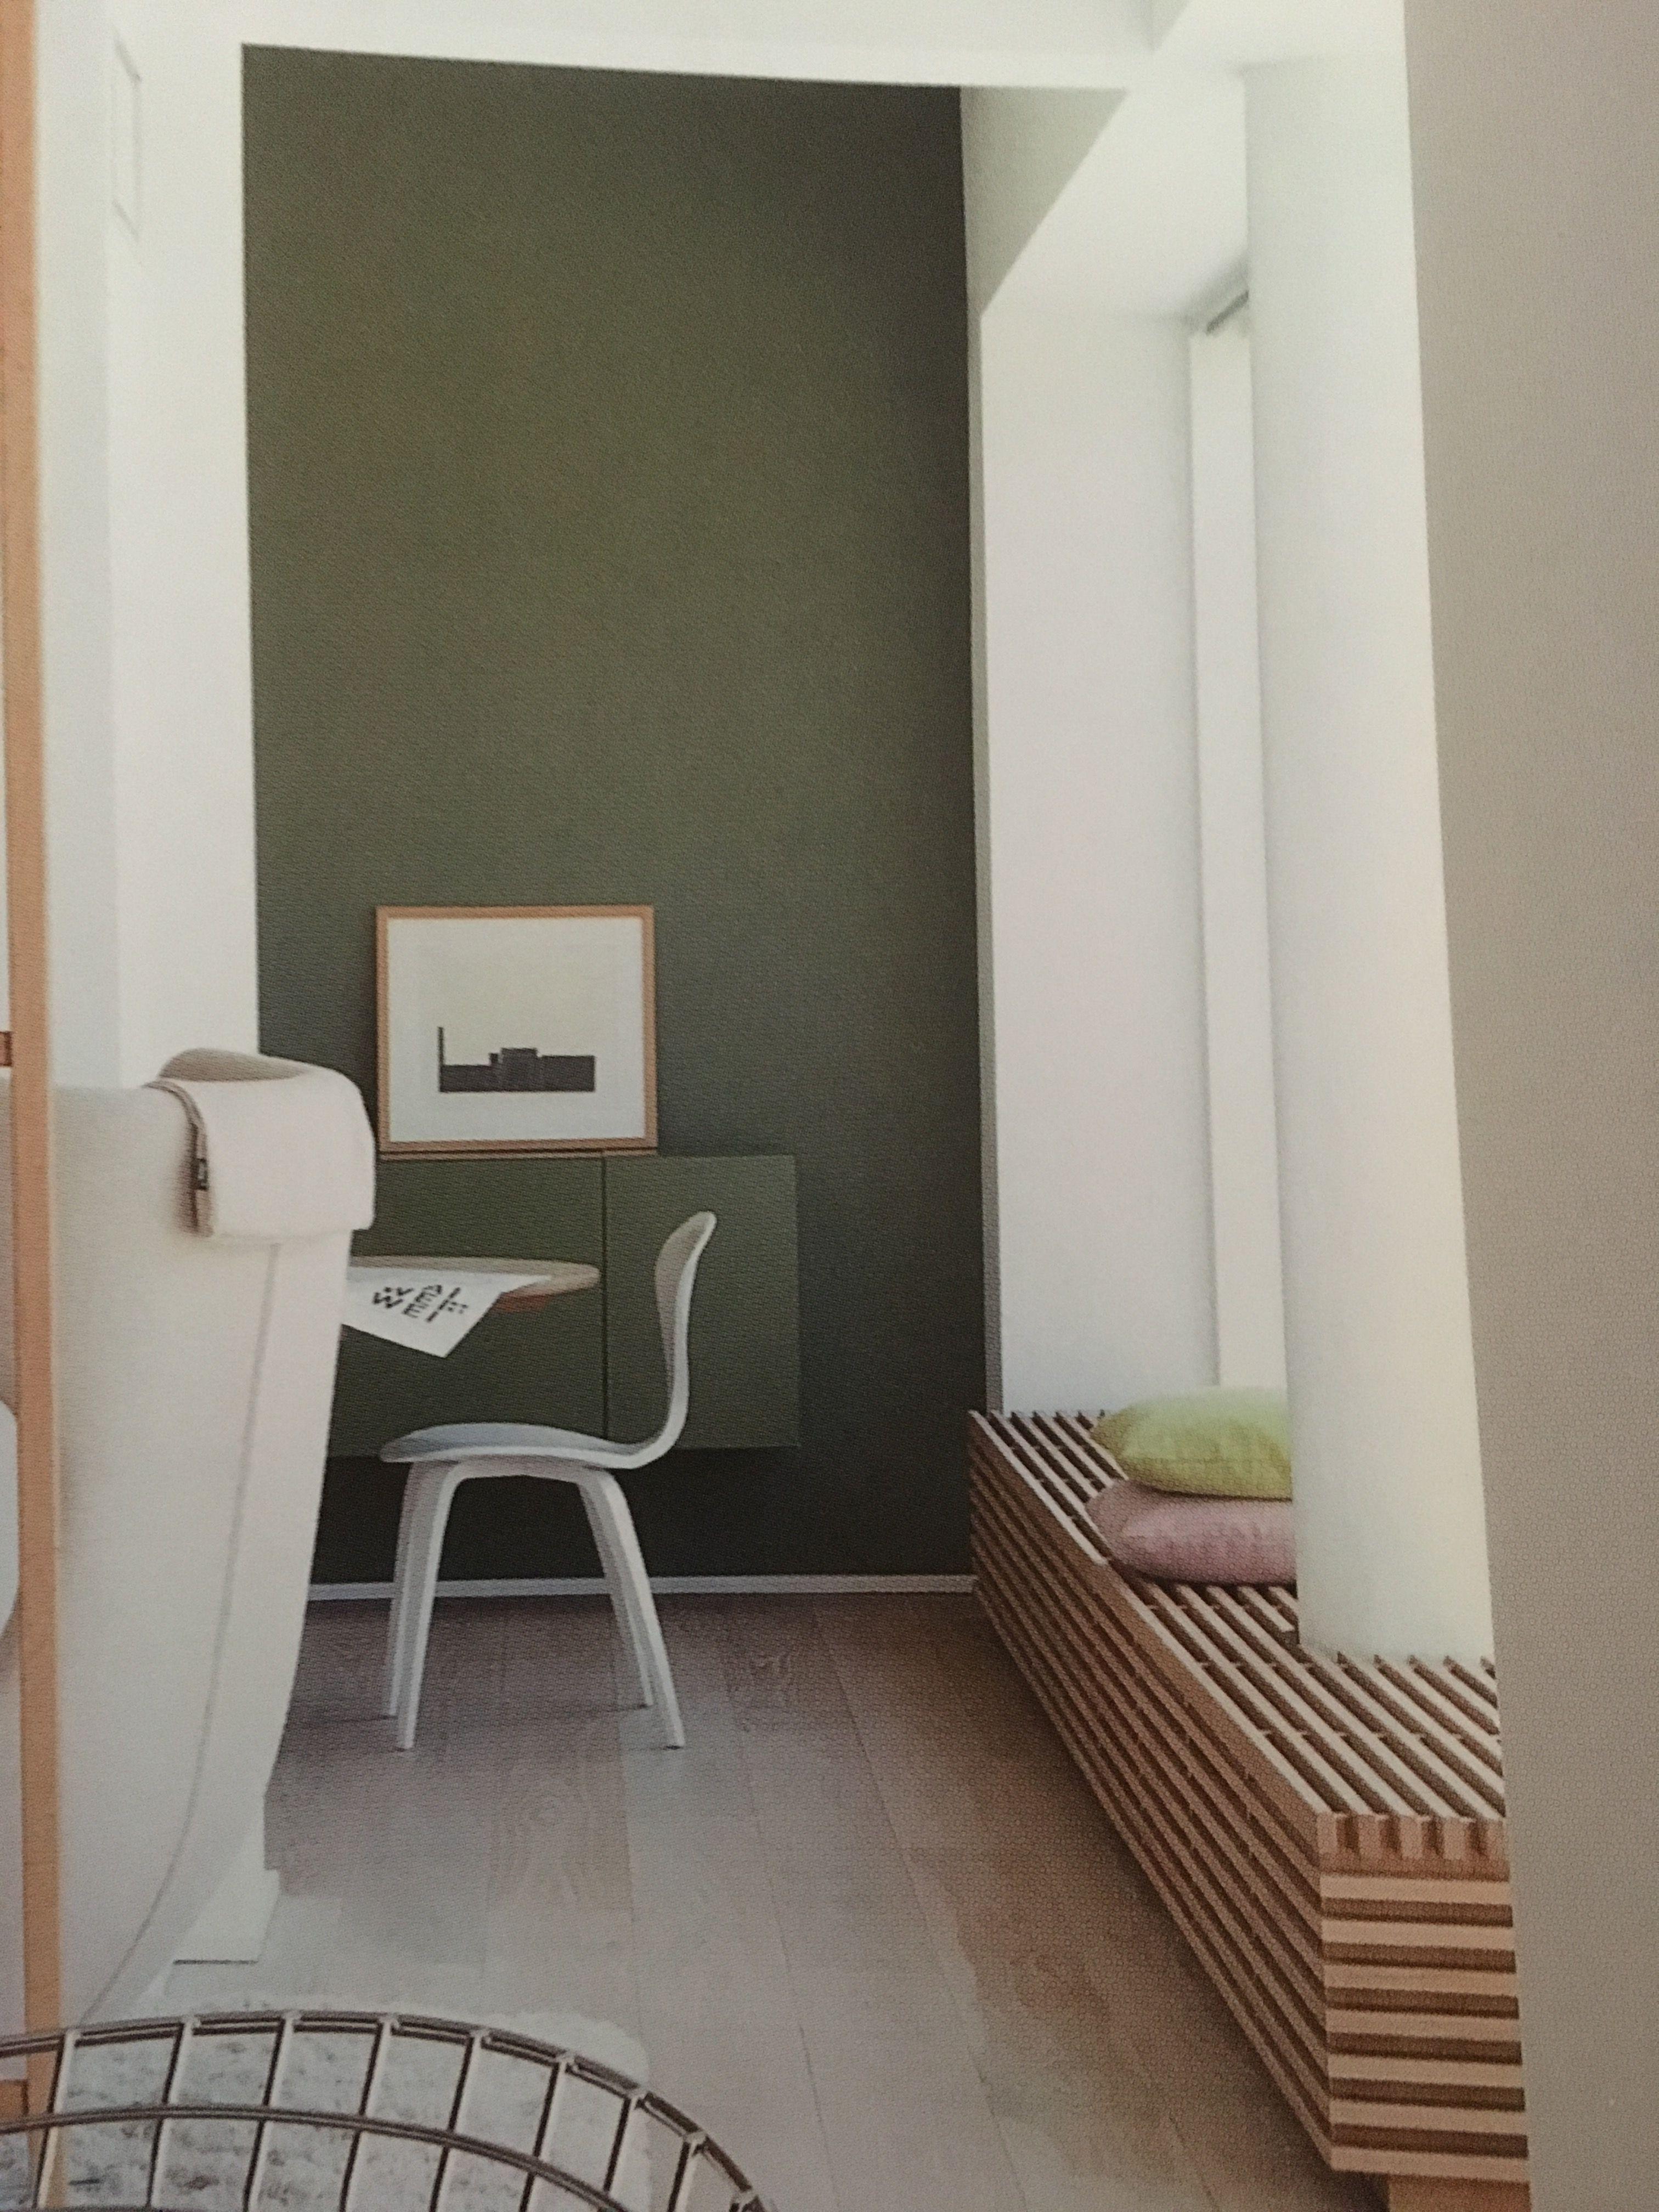 Olive green wall for old kitchen 인테리어, 벽, 올리브 그린